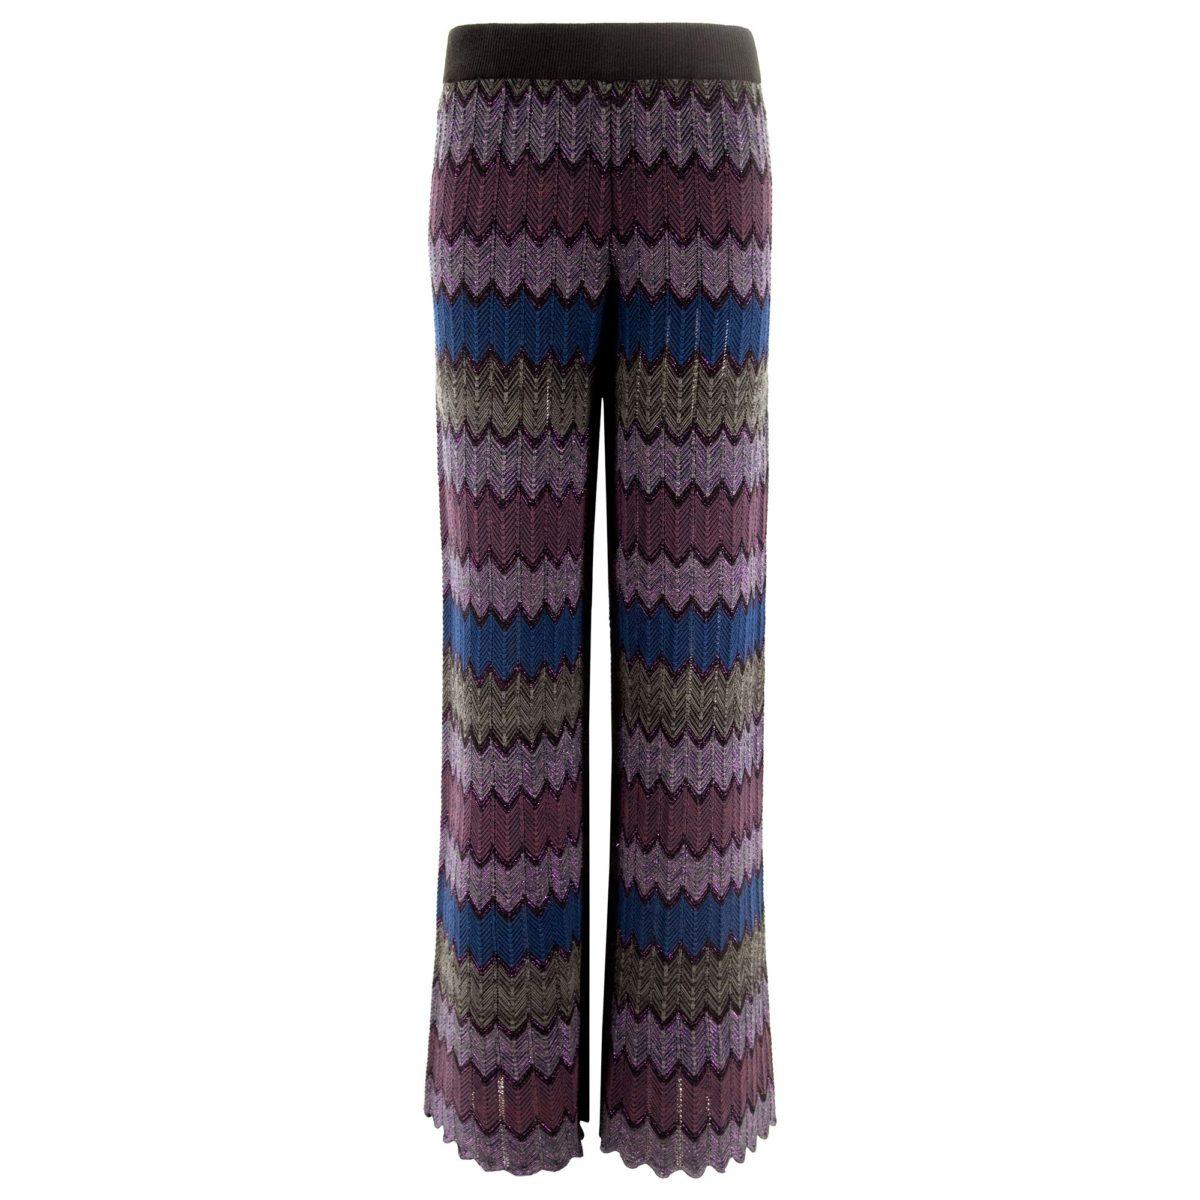 Pantalone Wide leg in maglia Viola/Blu - vista frontale | Nicla